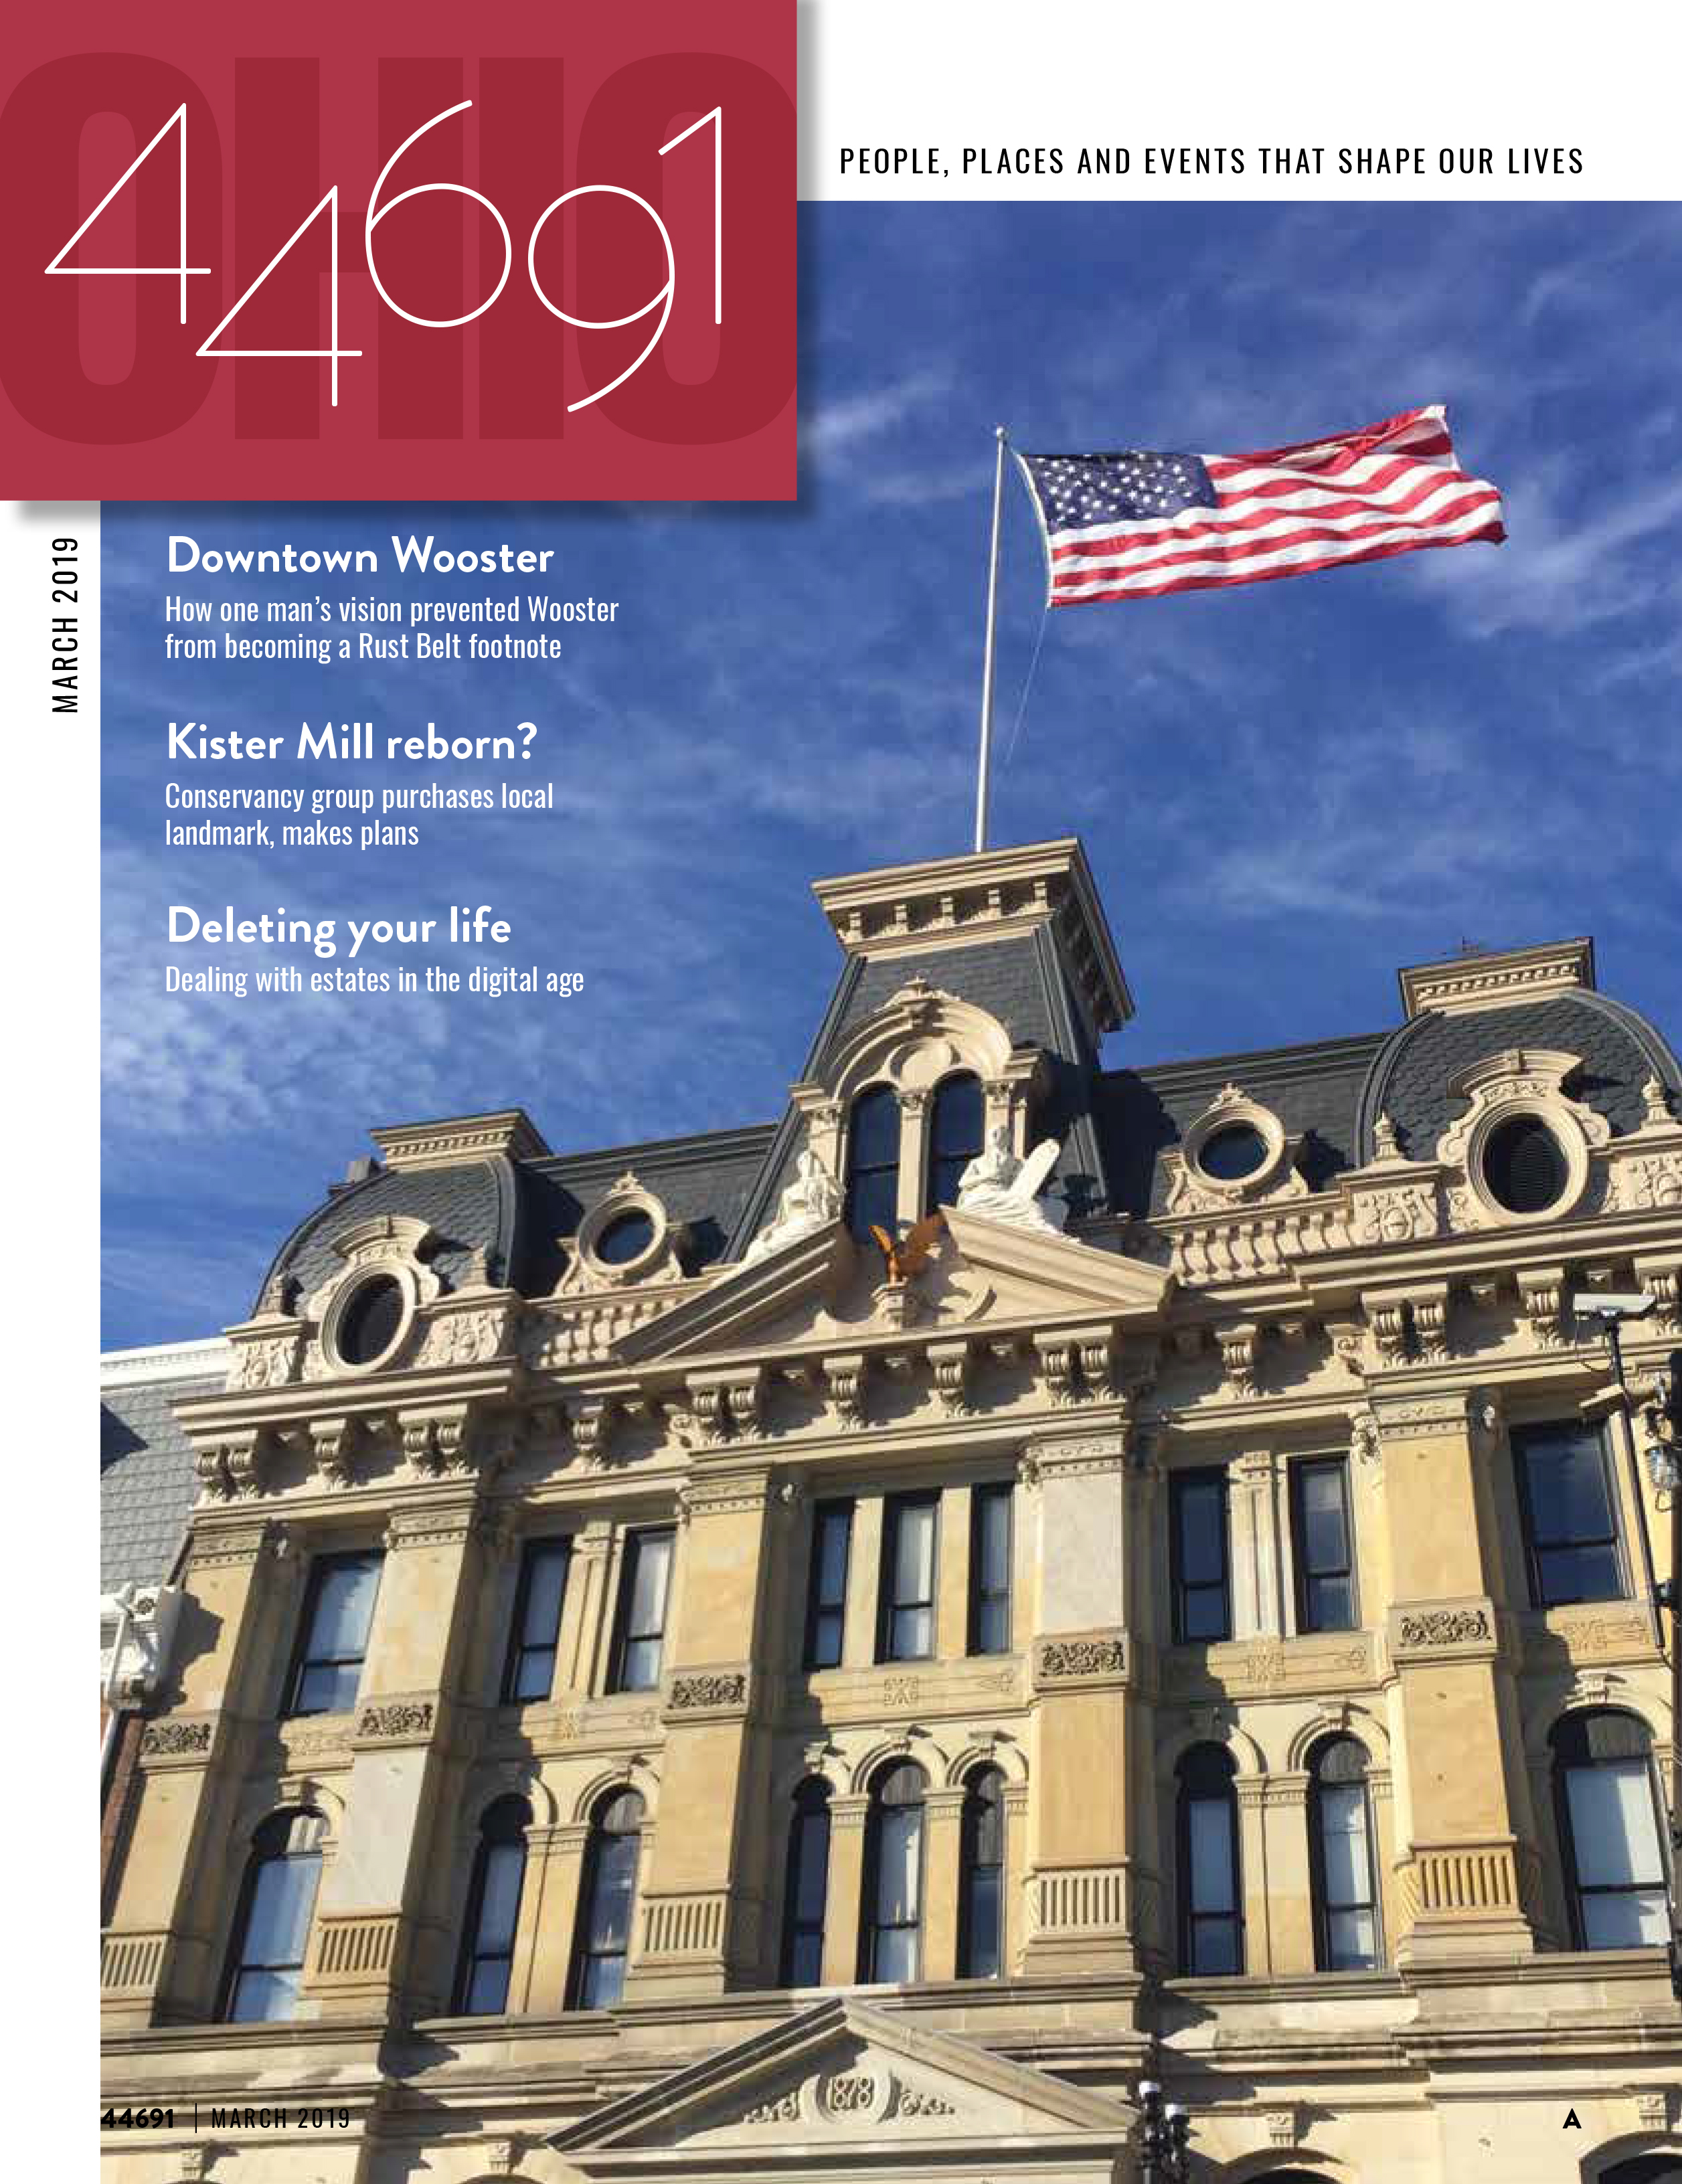 44691 Magazine cover